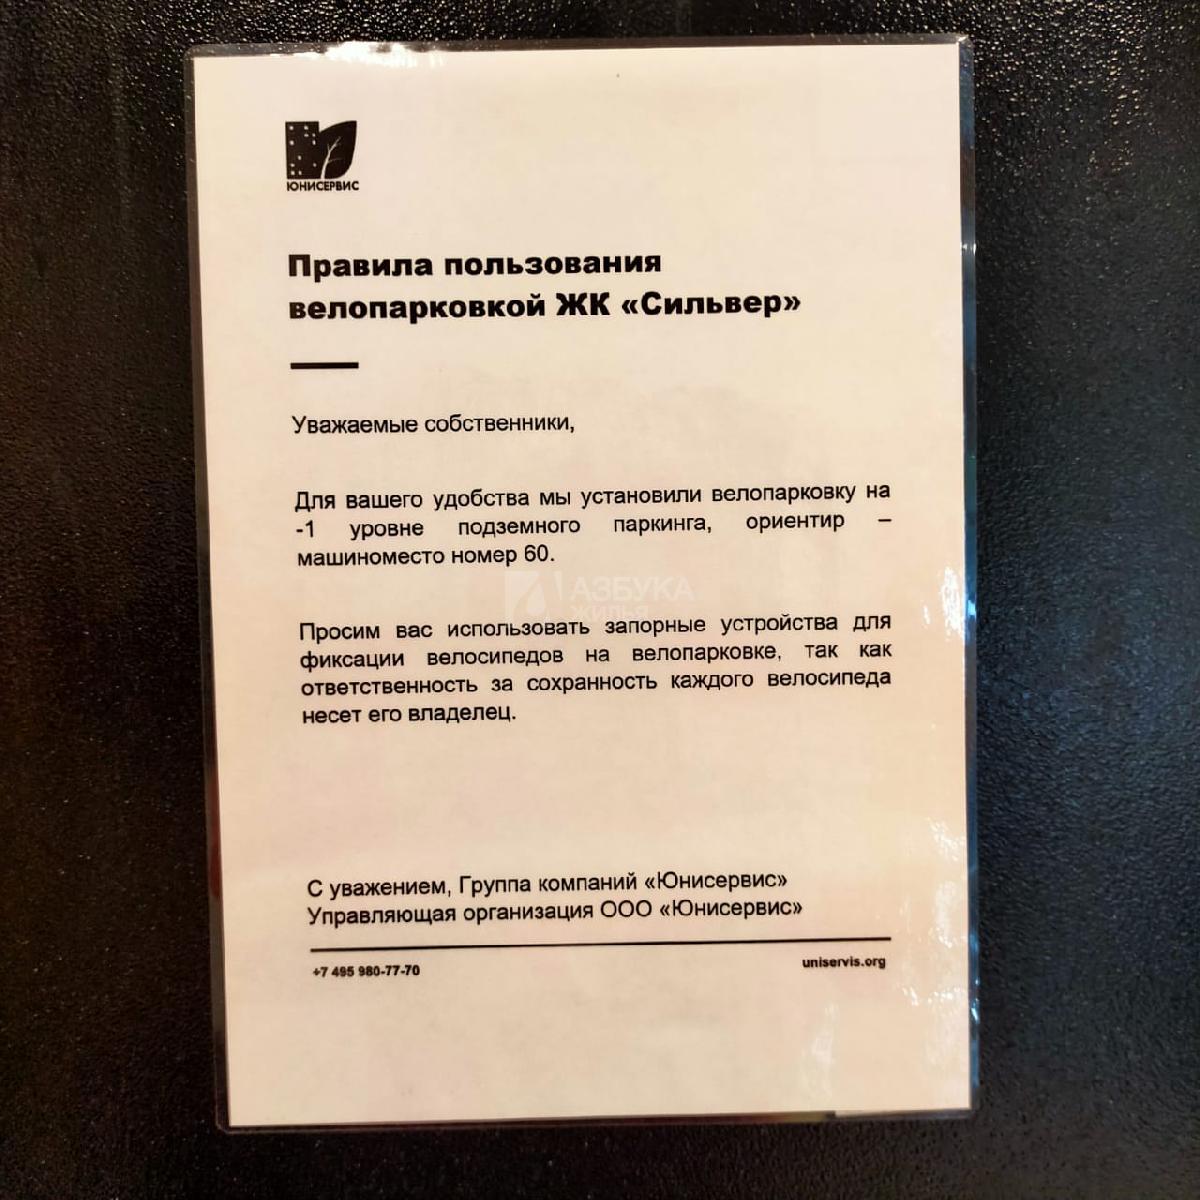 Фото №27 - 3-комнатная квартира, Москва, Серебрякова проезд 11 корпус 1, метро Ботанический сад